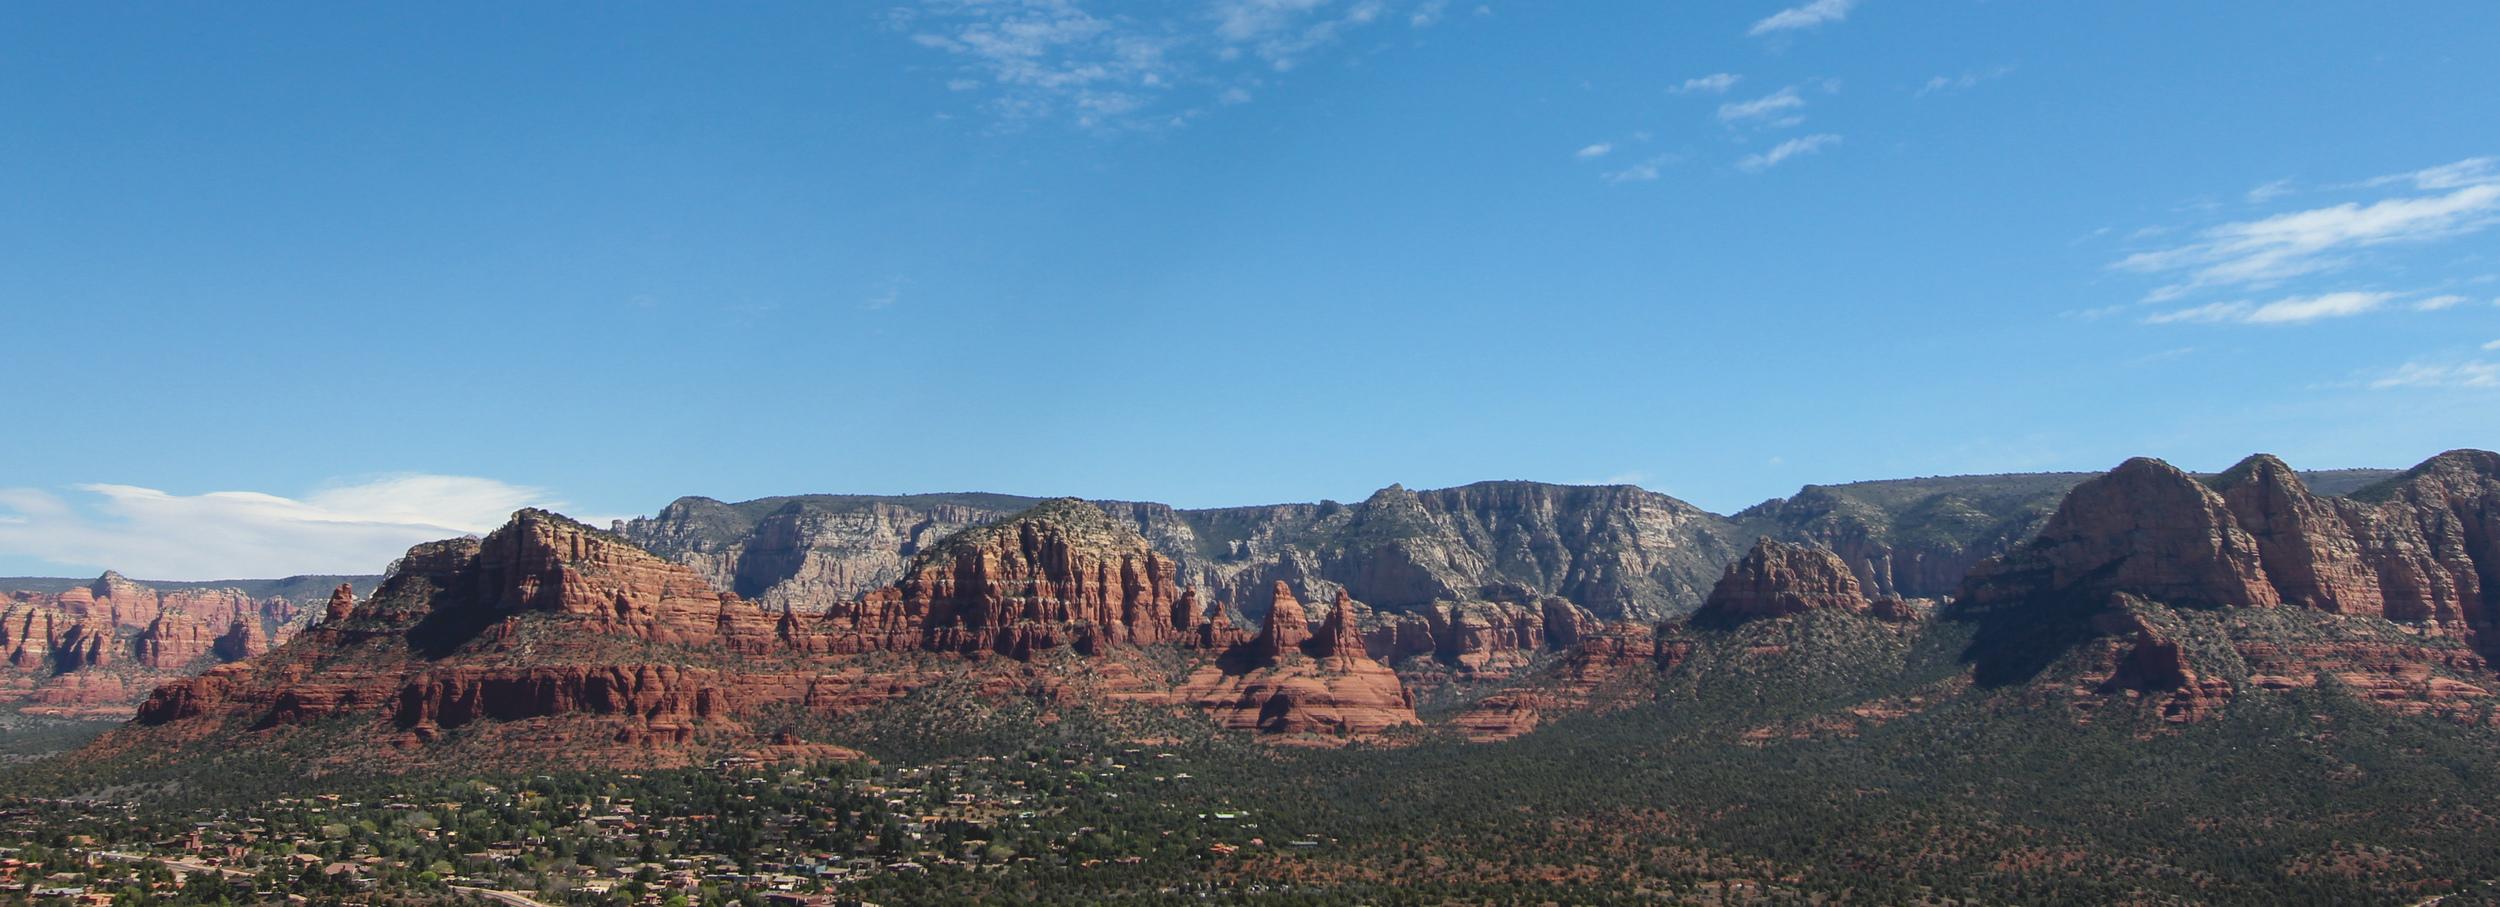 Honeymoon_Arizona_JonCourvillePhotography-7.jpg